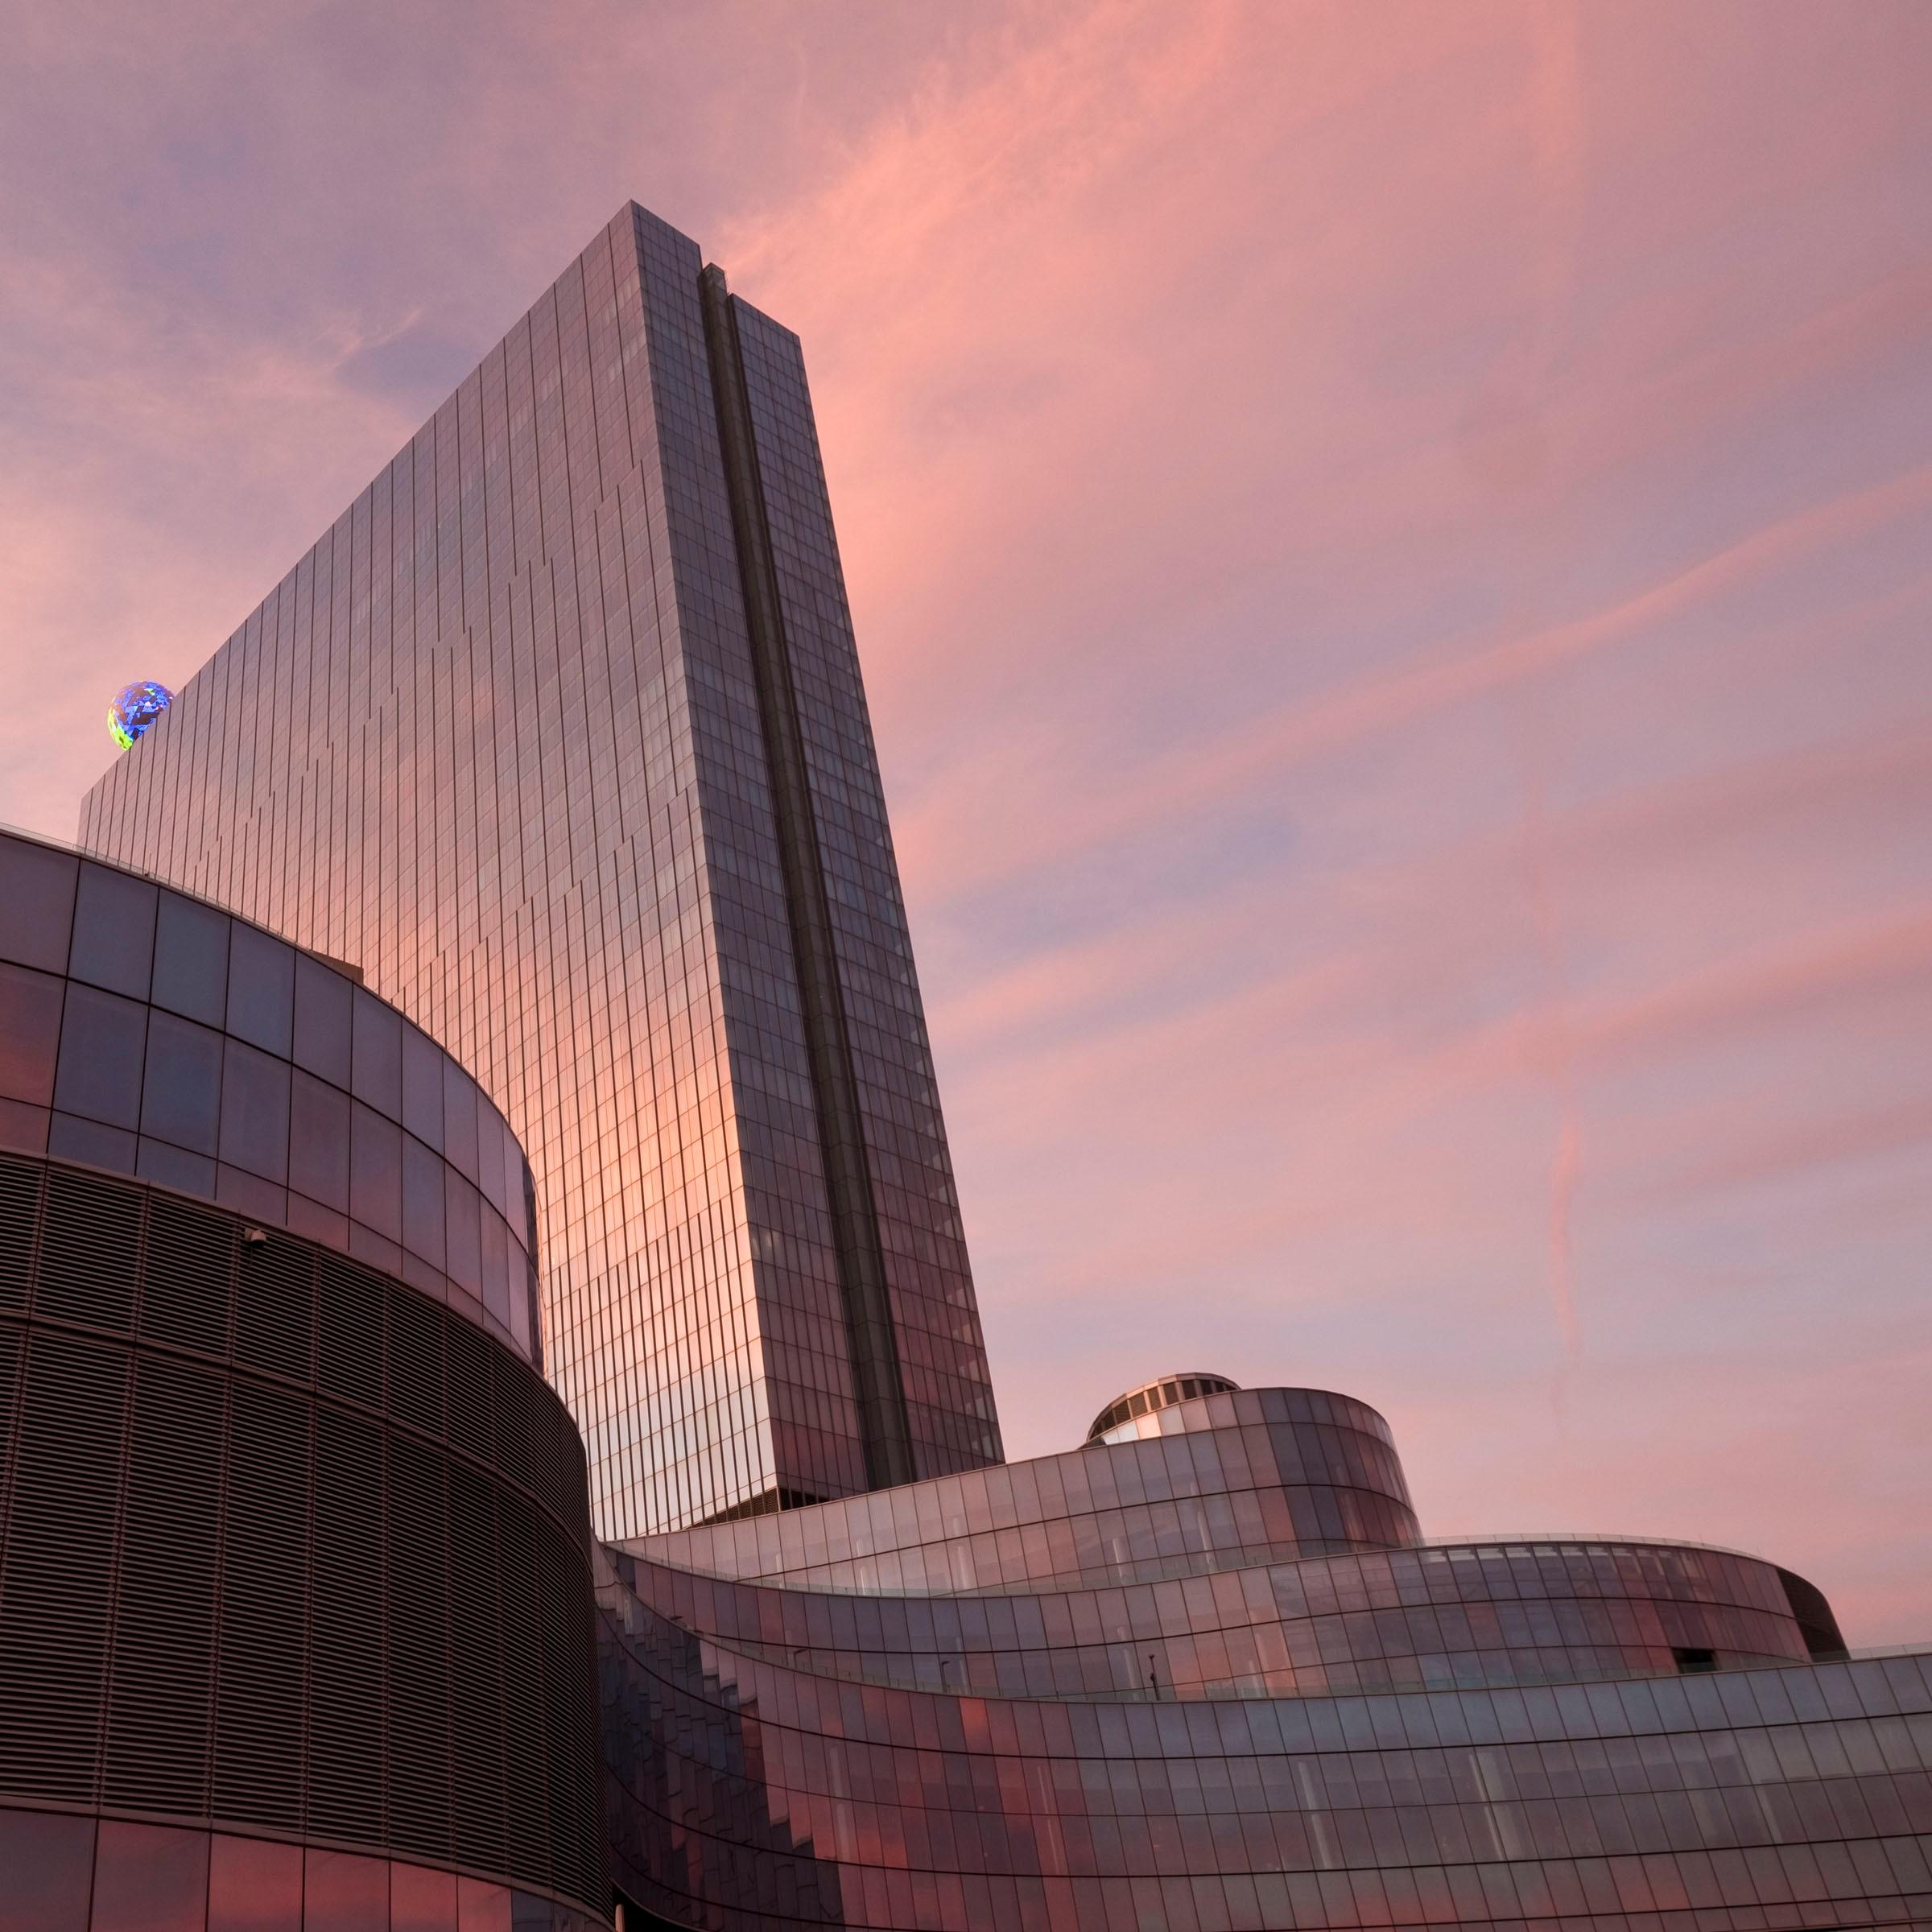 Revel Casino Hotel, Atlantic Ci - keithbeaty | ello